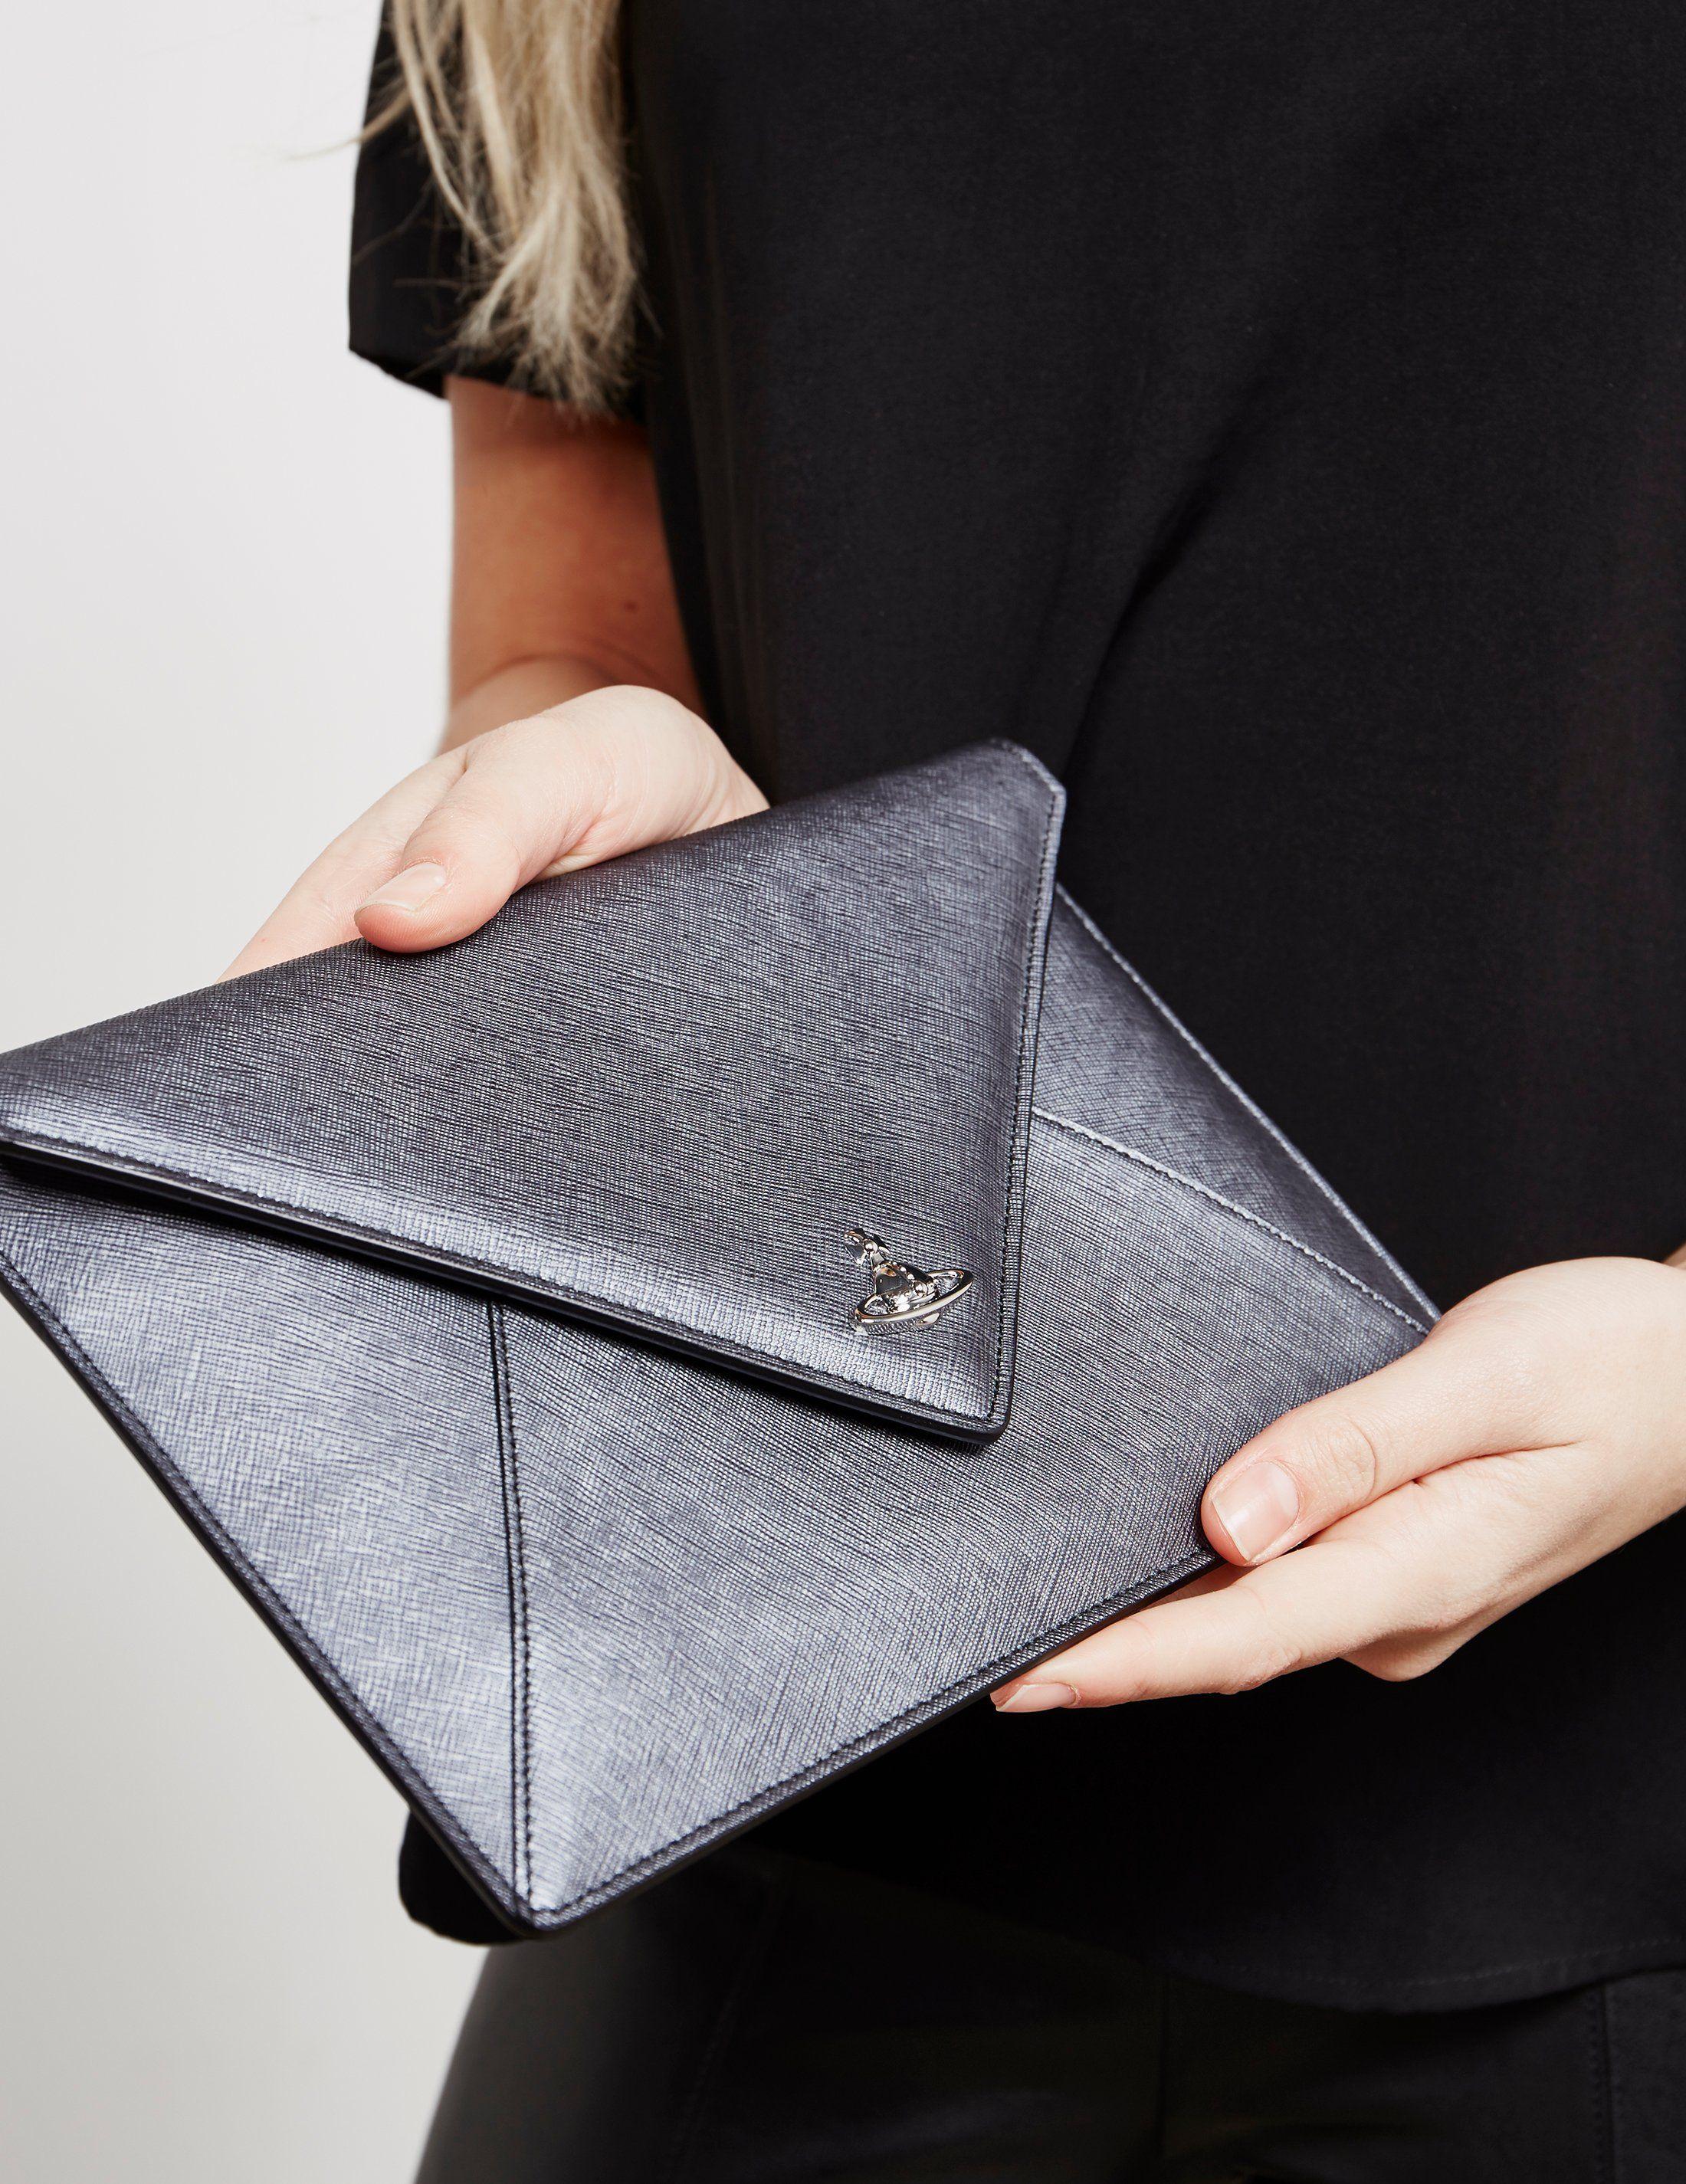 Vivienne Westwood Envelope Clutch Bag